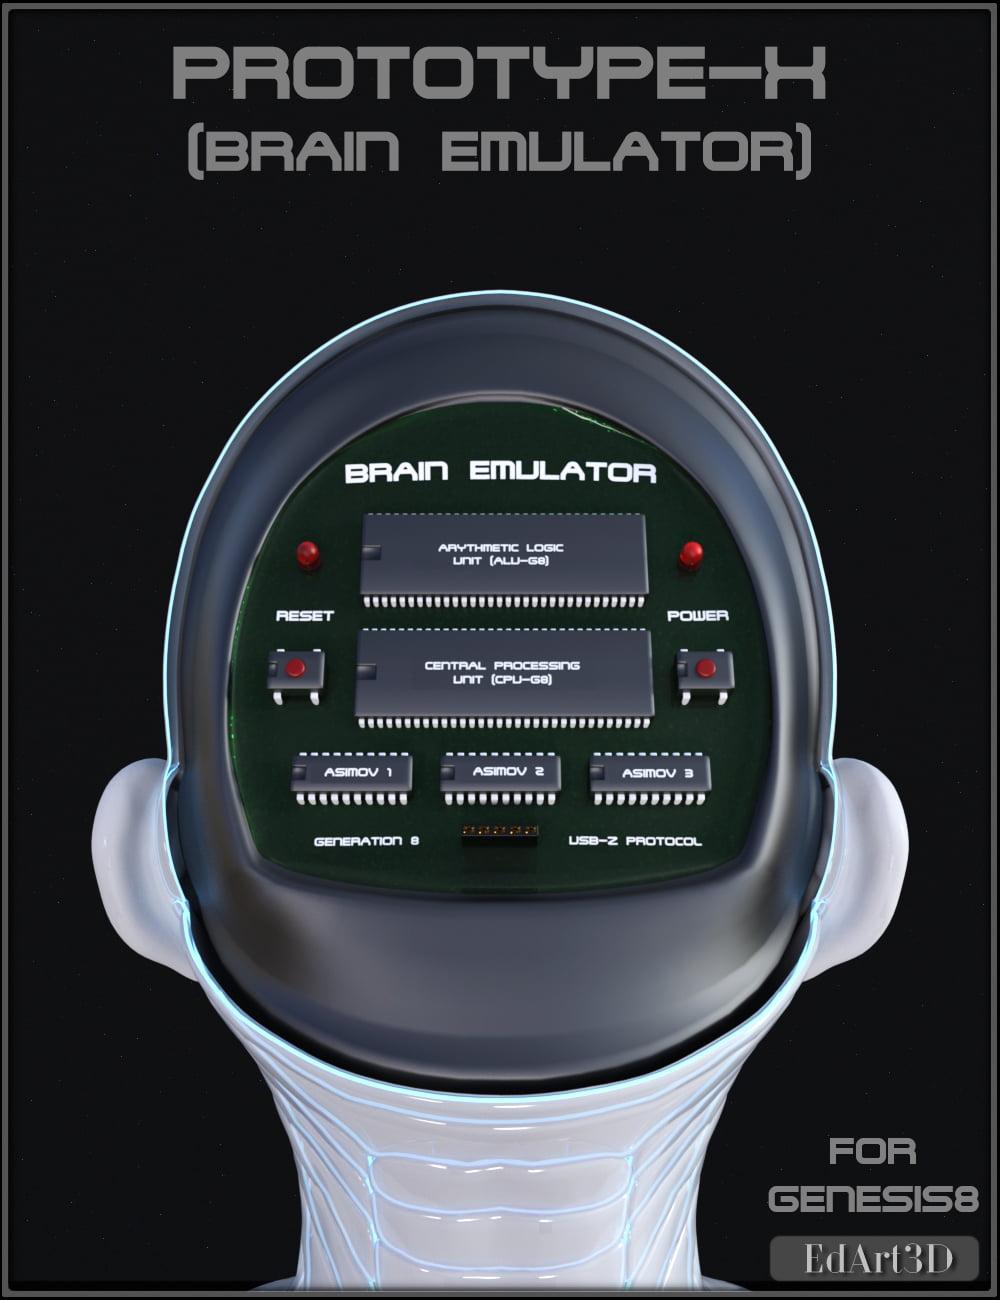 PROTOTYPE-X (Brain Emulator) for G8F